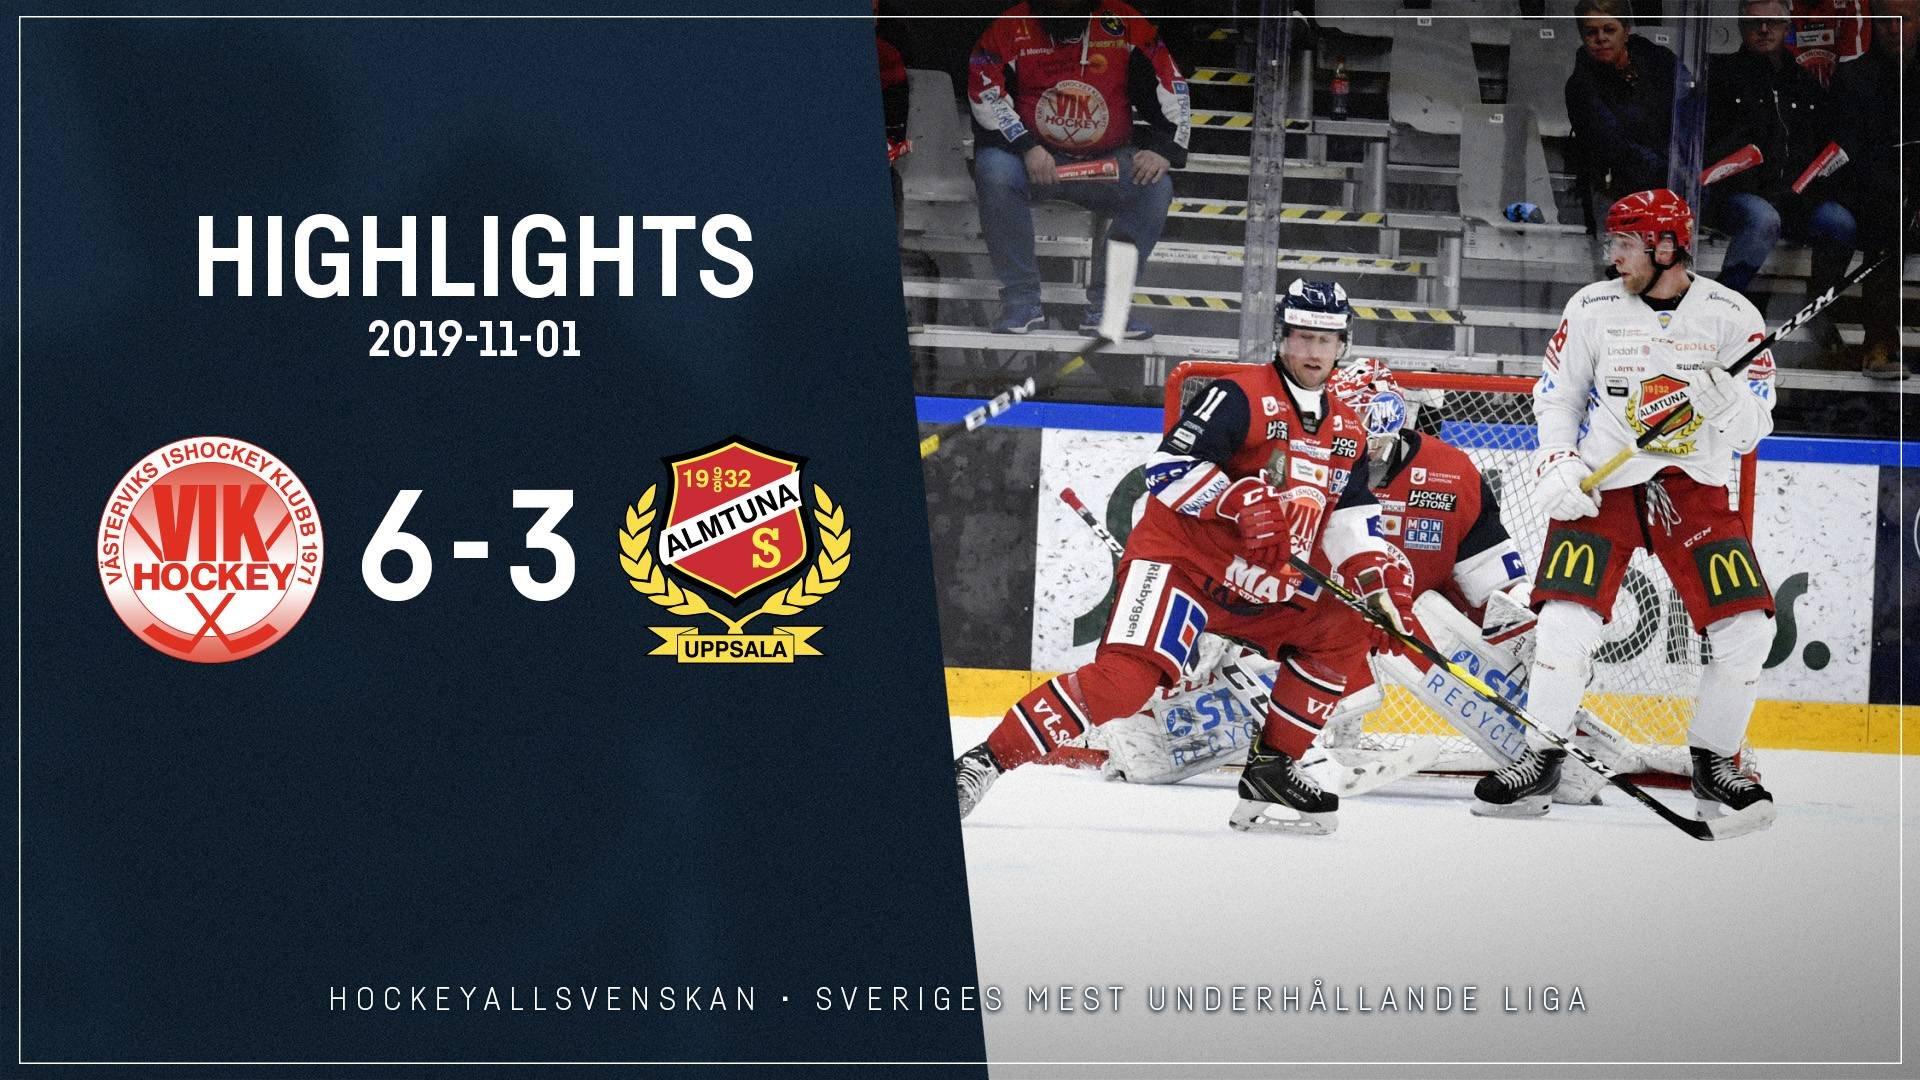 2019-11-01 Västervik - Almtuna 6-3